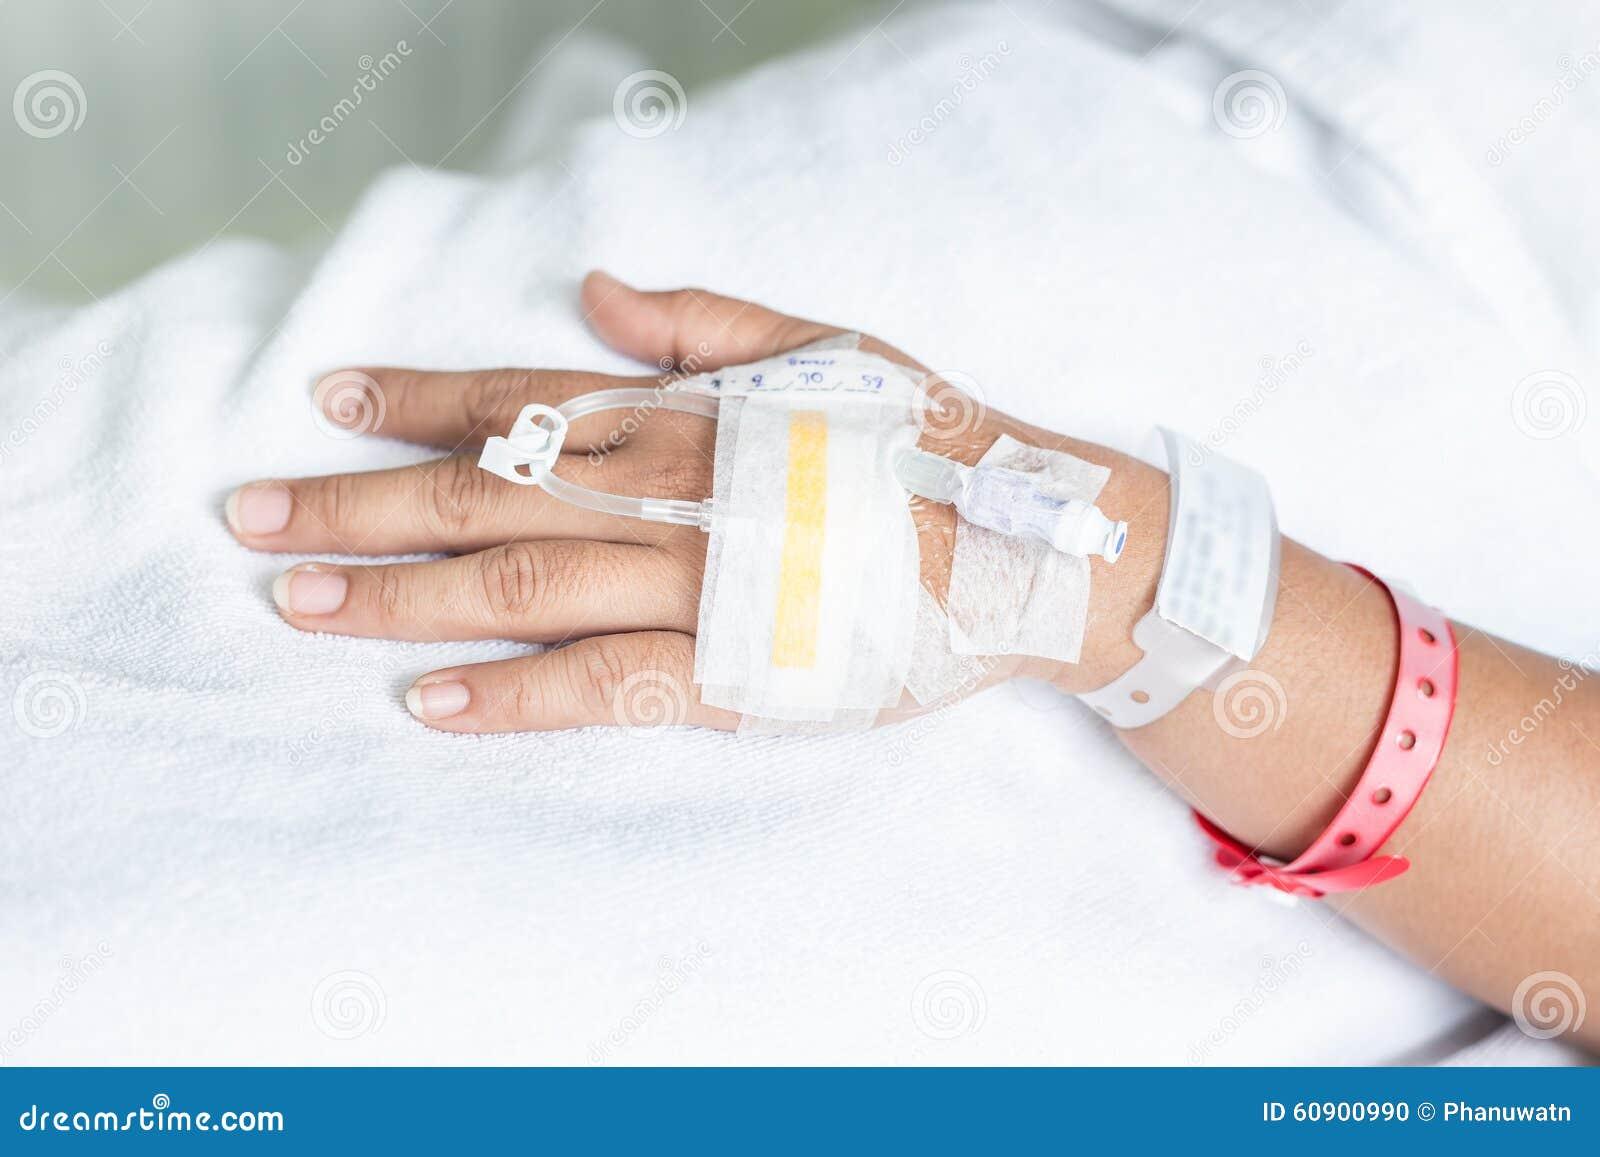 Iv hook up hospital